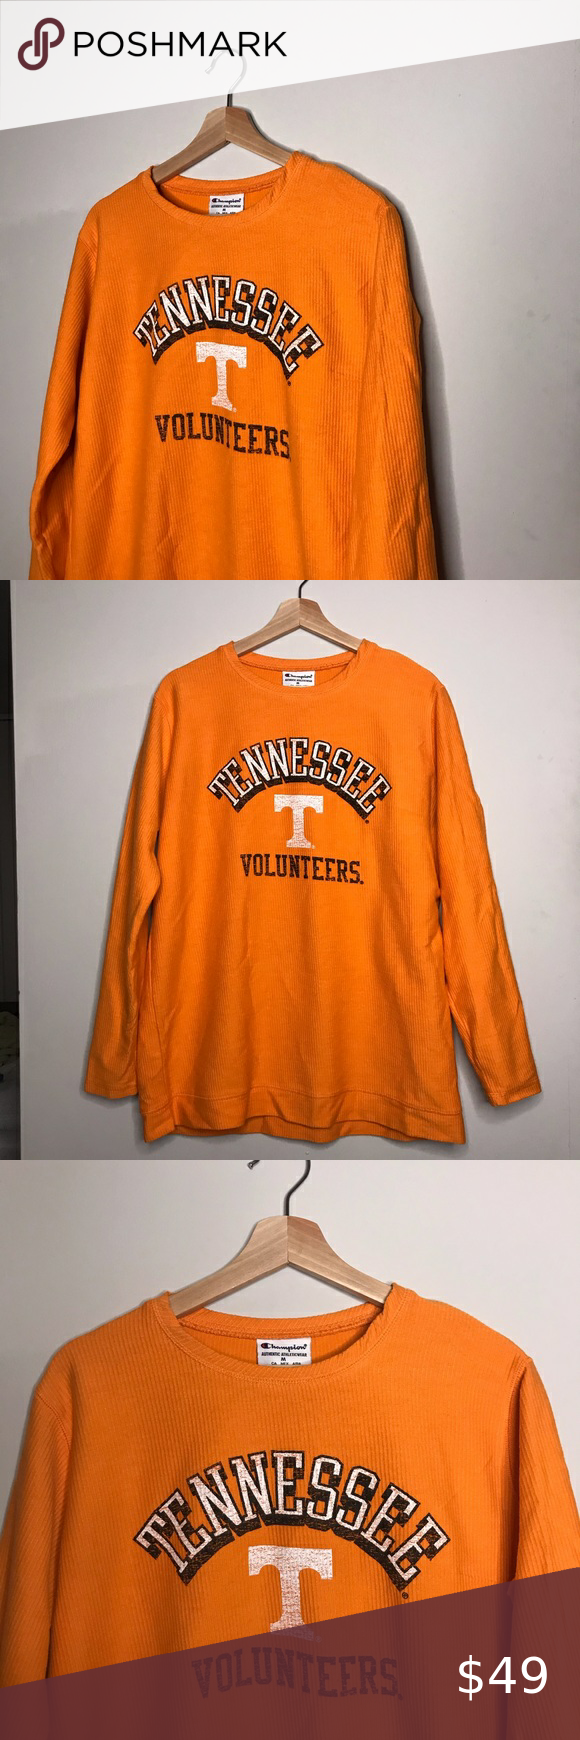 Champion Vintage Orange Soft Sweatshirt Size M Sweatshirts Soft Sweatshirts Oversized Sweatshirt [ 1740 x 580 Pixel ]